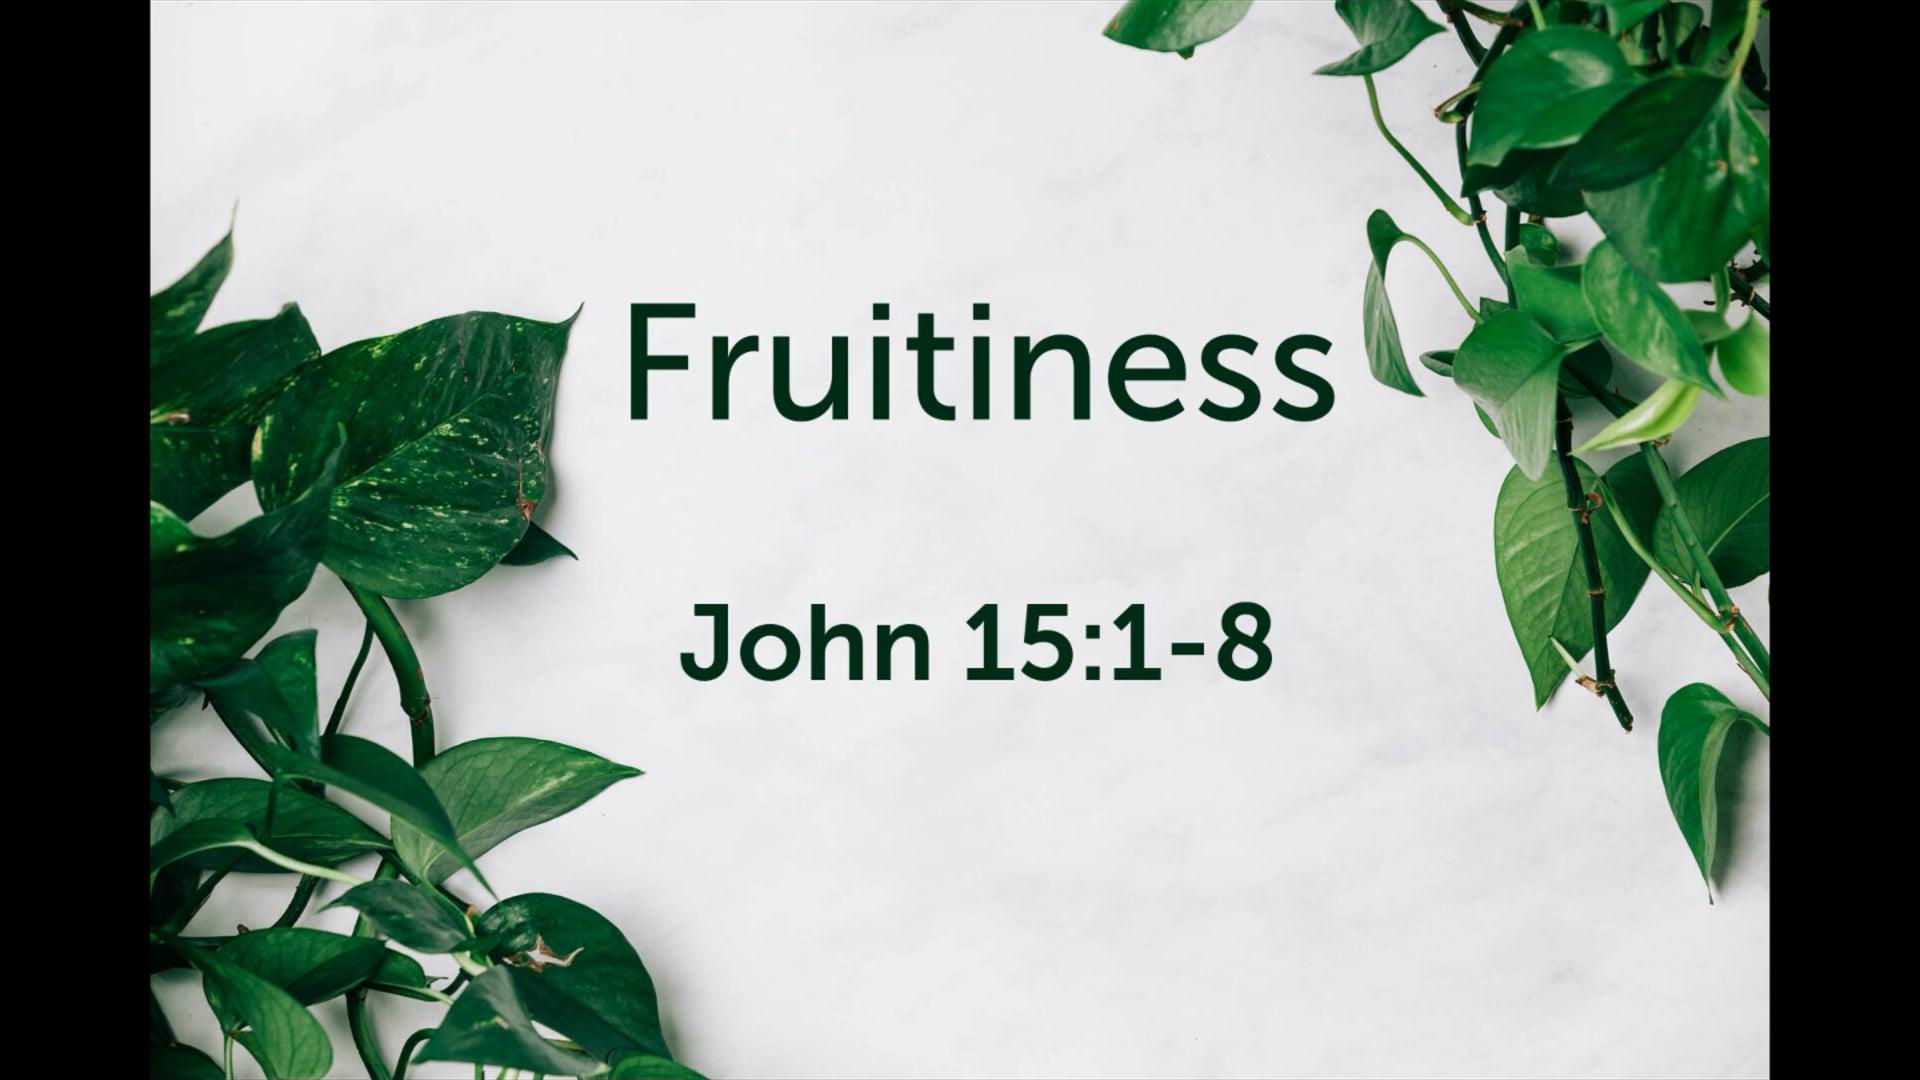 Fruitniness - John 15_1-8.mp4